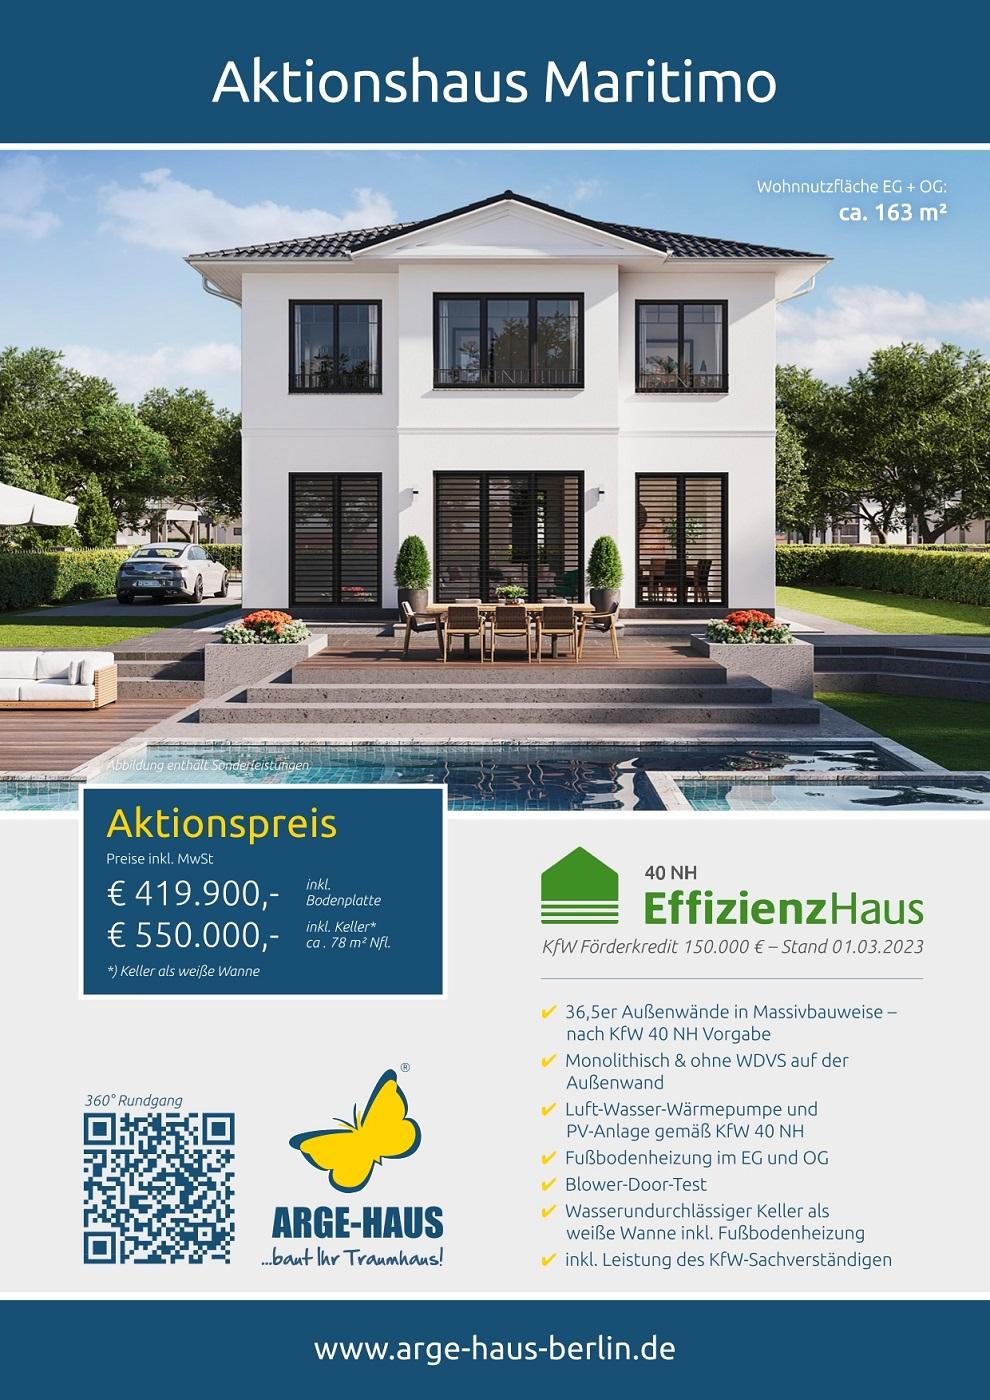 aktionshaus-maritimo-1